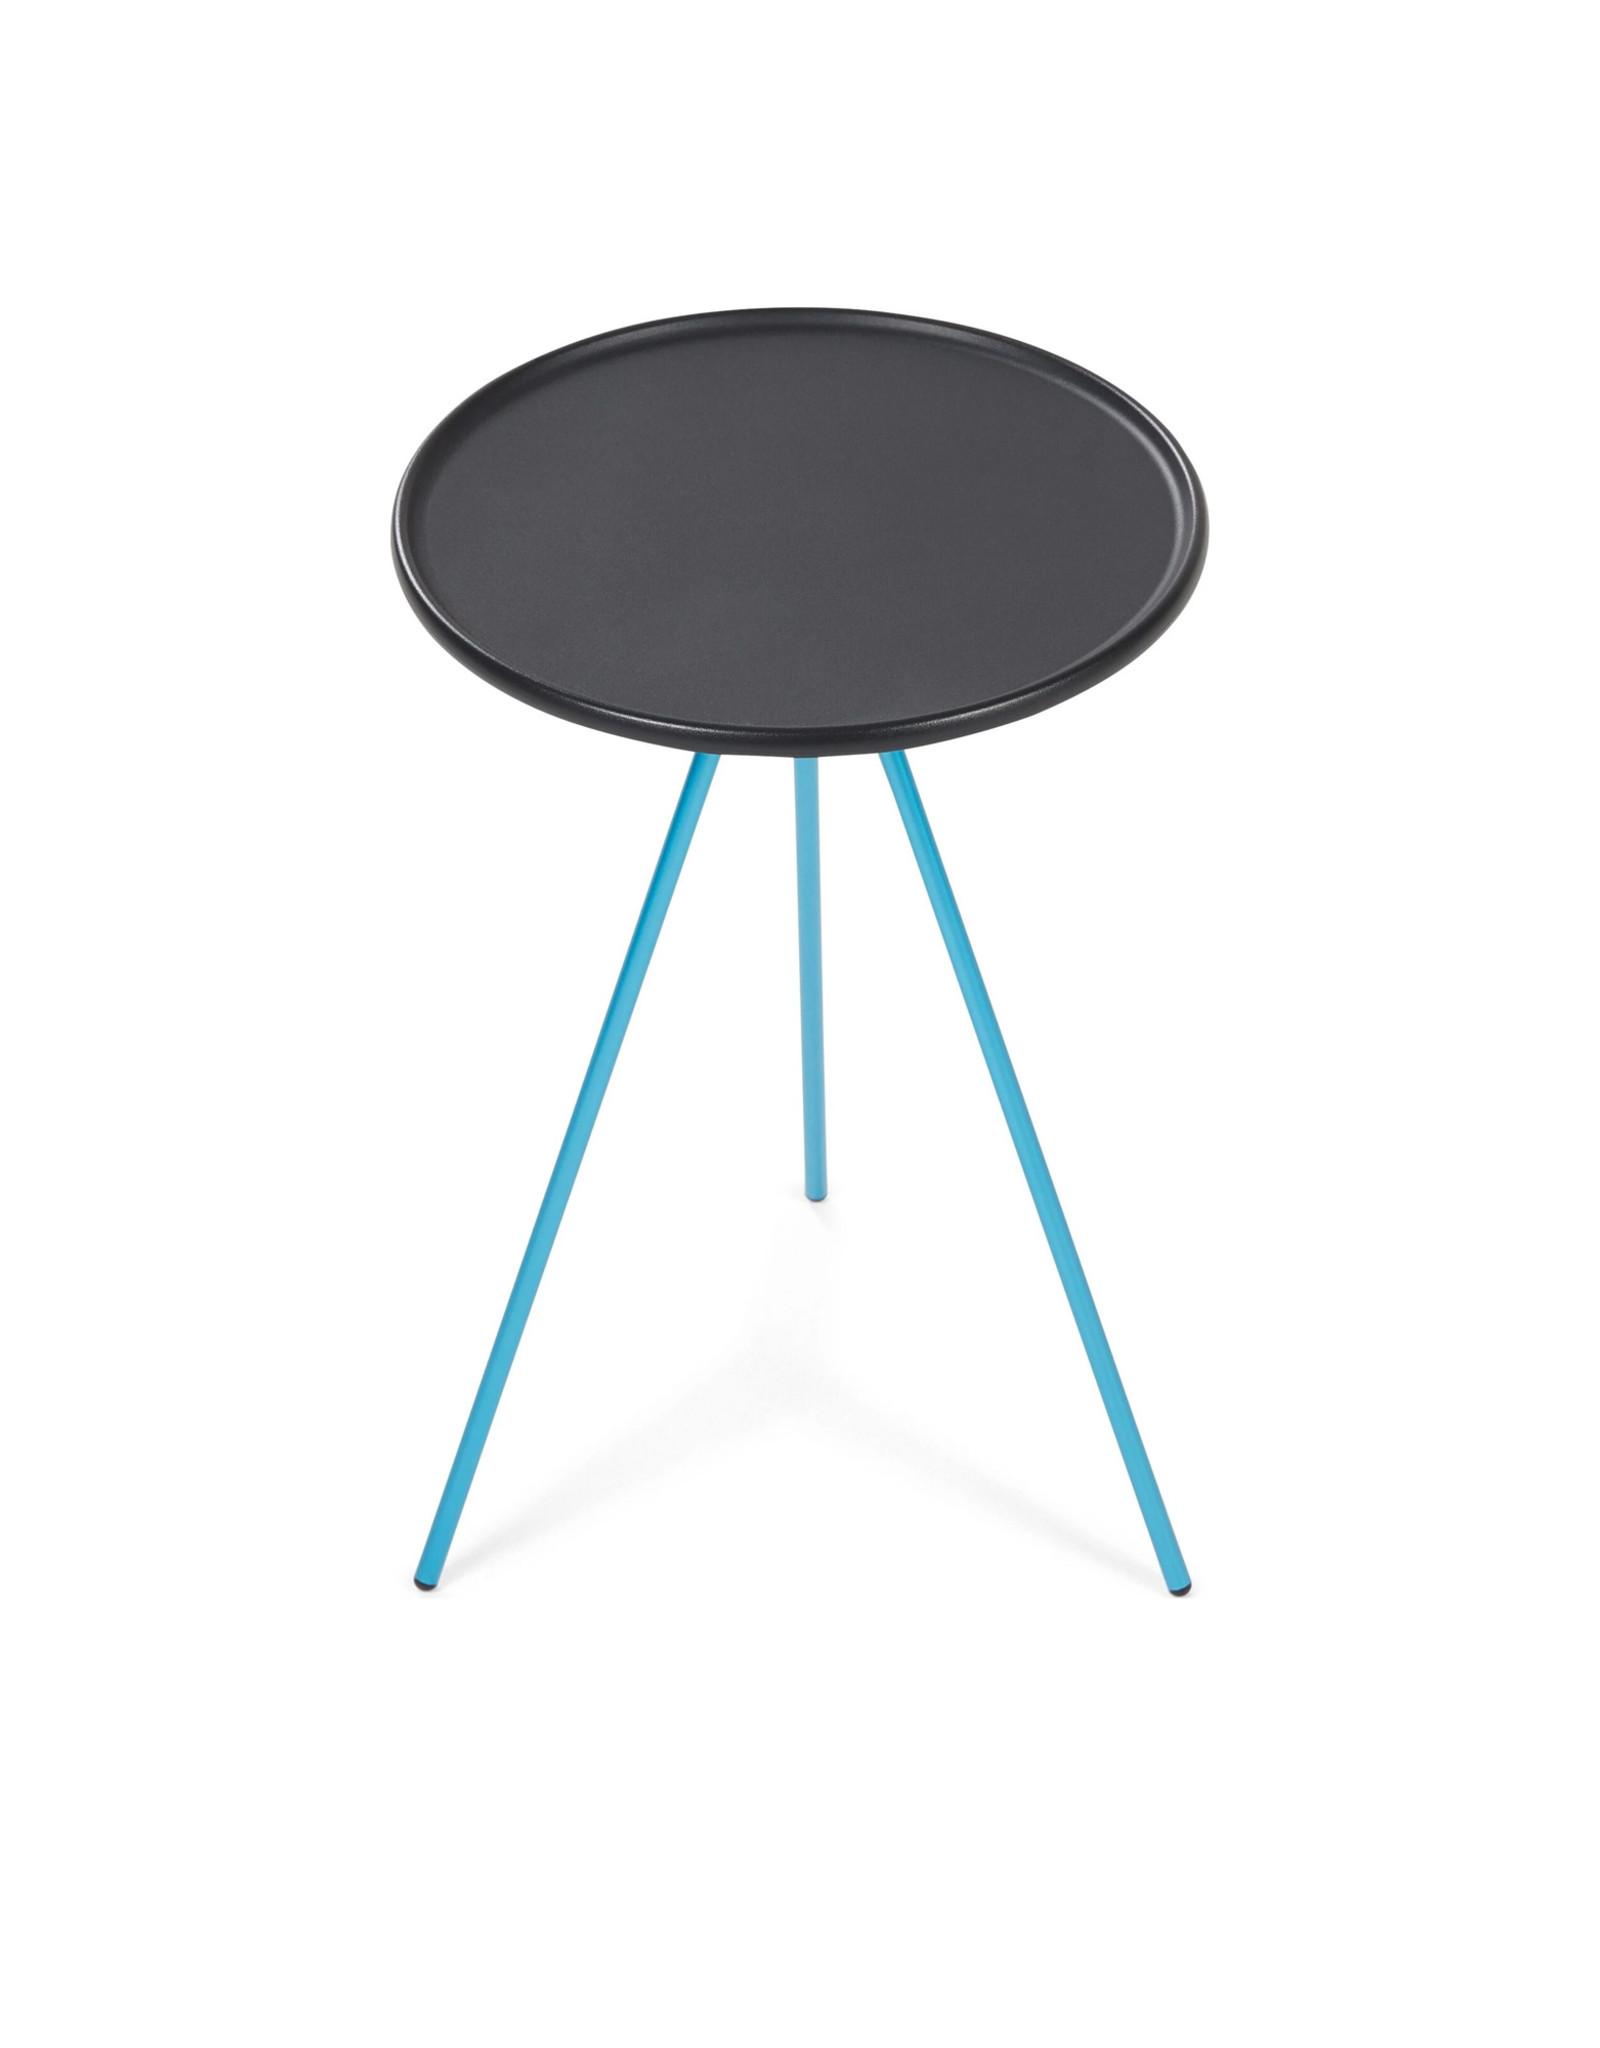 Helinox Helinox Side Table Small - Black